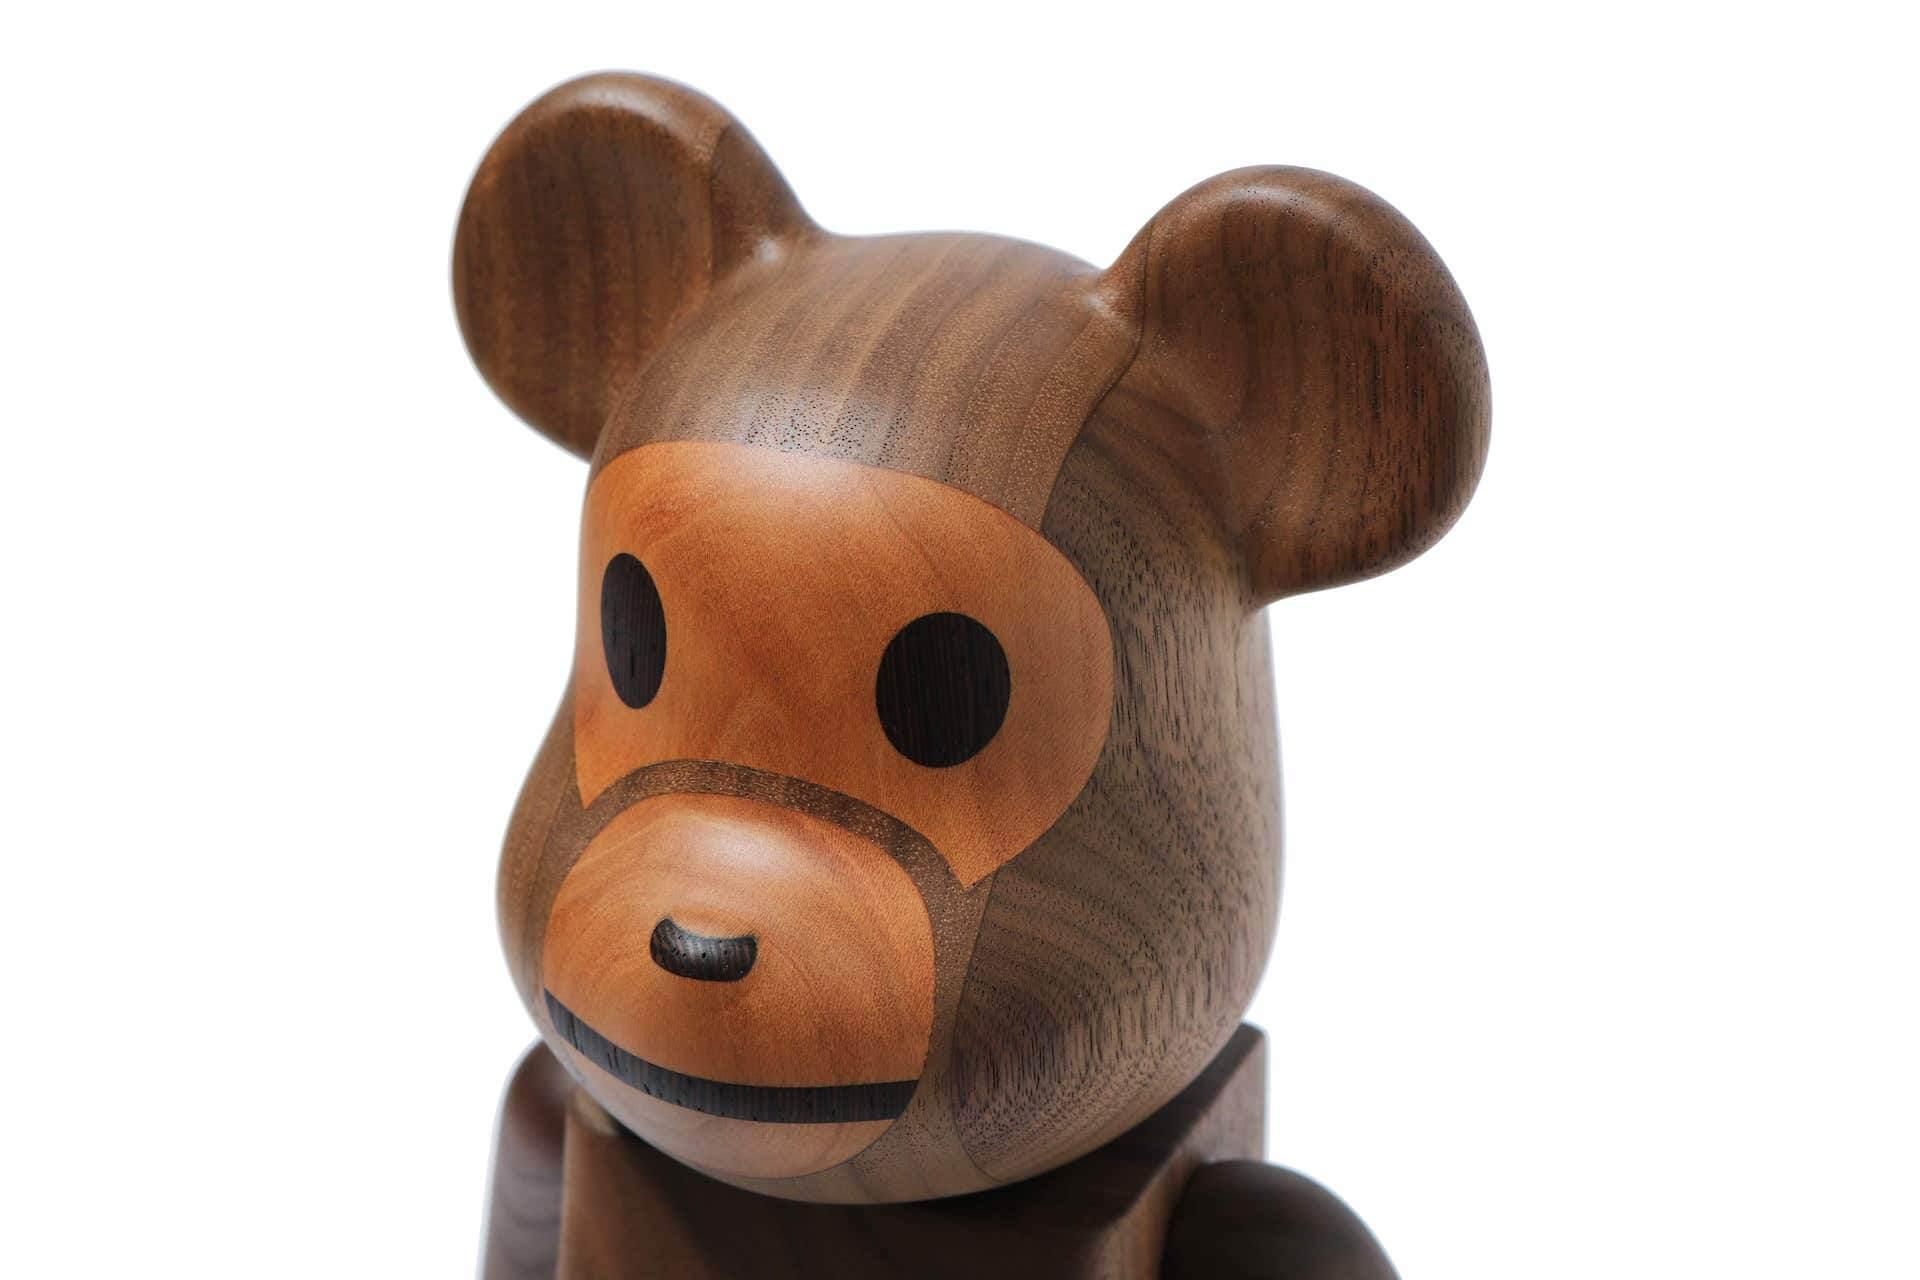 A BATHING APE(R)×カリモク×メディコム・トイのトリプルコラボ!BABY MILO(R)の木製BE@RBRICKが登場 ac200526_bearbrick_06